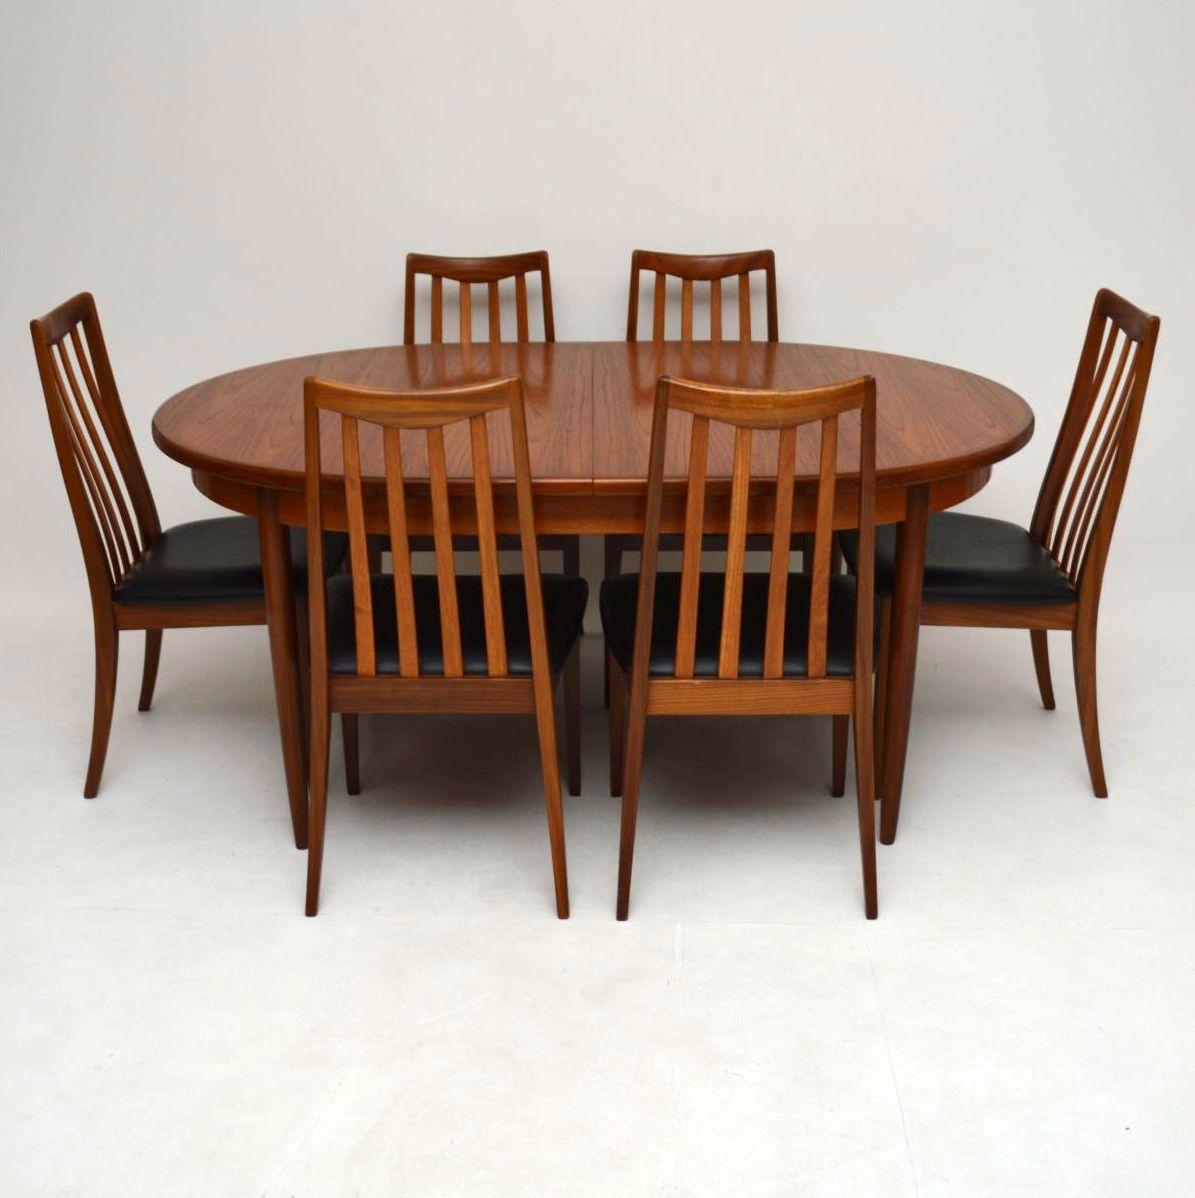 Retro Teak Dining Table Six Chairs By G Plan Vintage 1960 S Retrospective Interiors Retro Furniture Vintage Mid Century Furniture Vintage Danish Modern Furniture Antique Furniture London